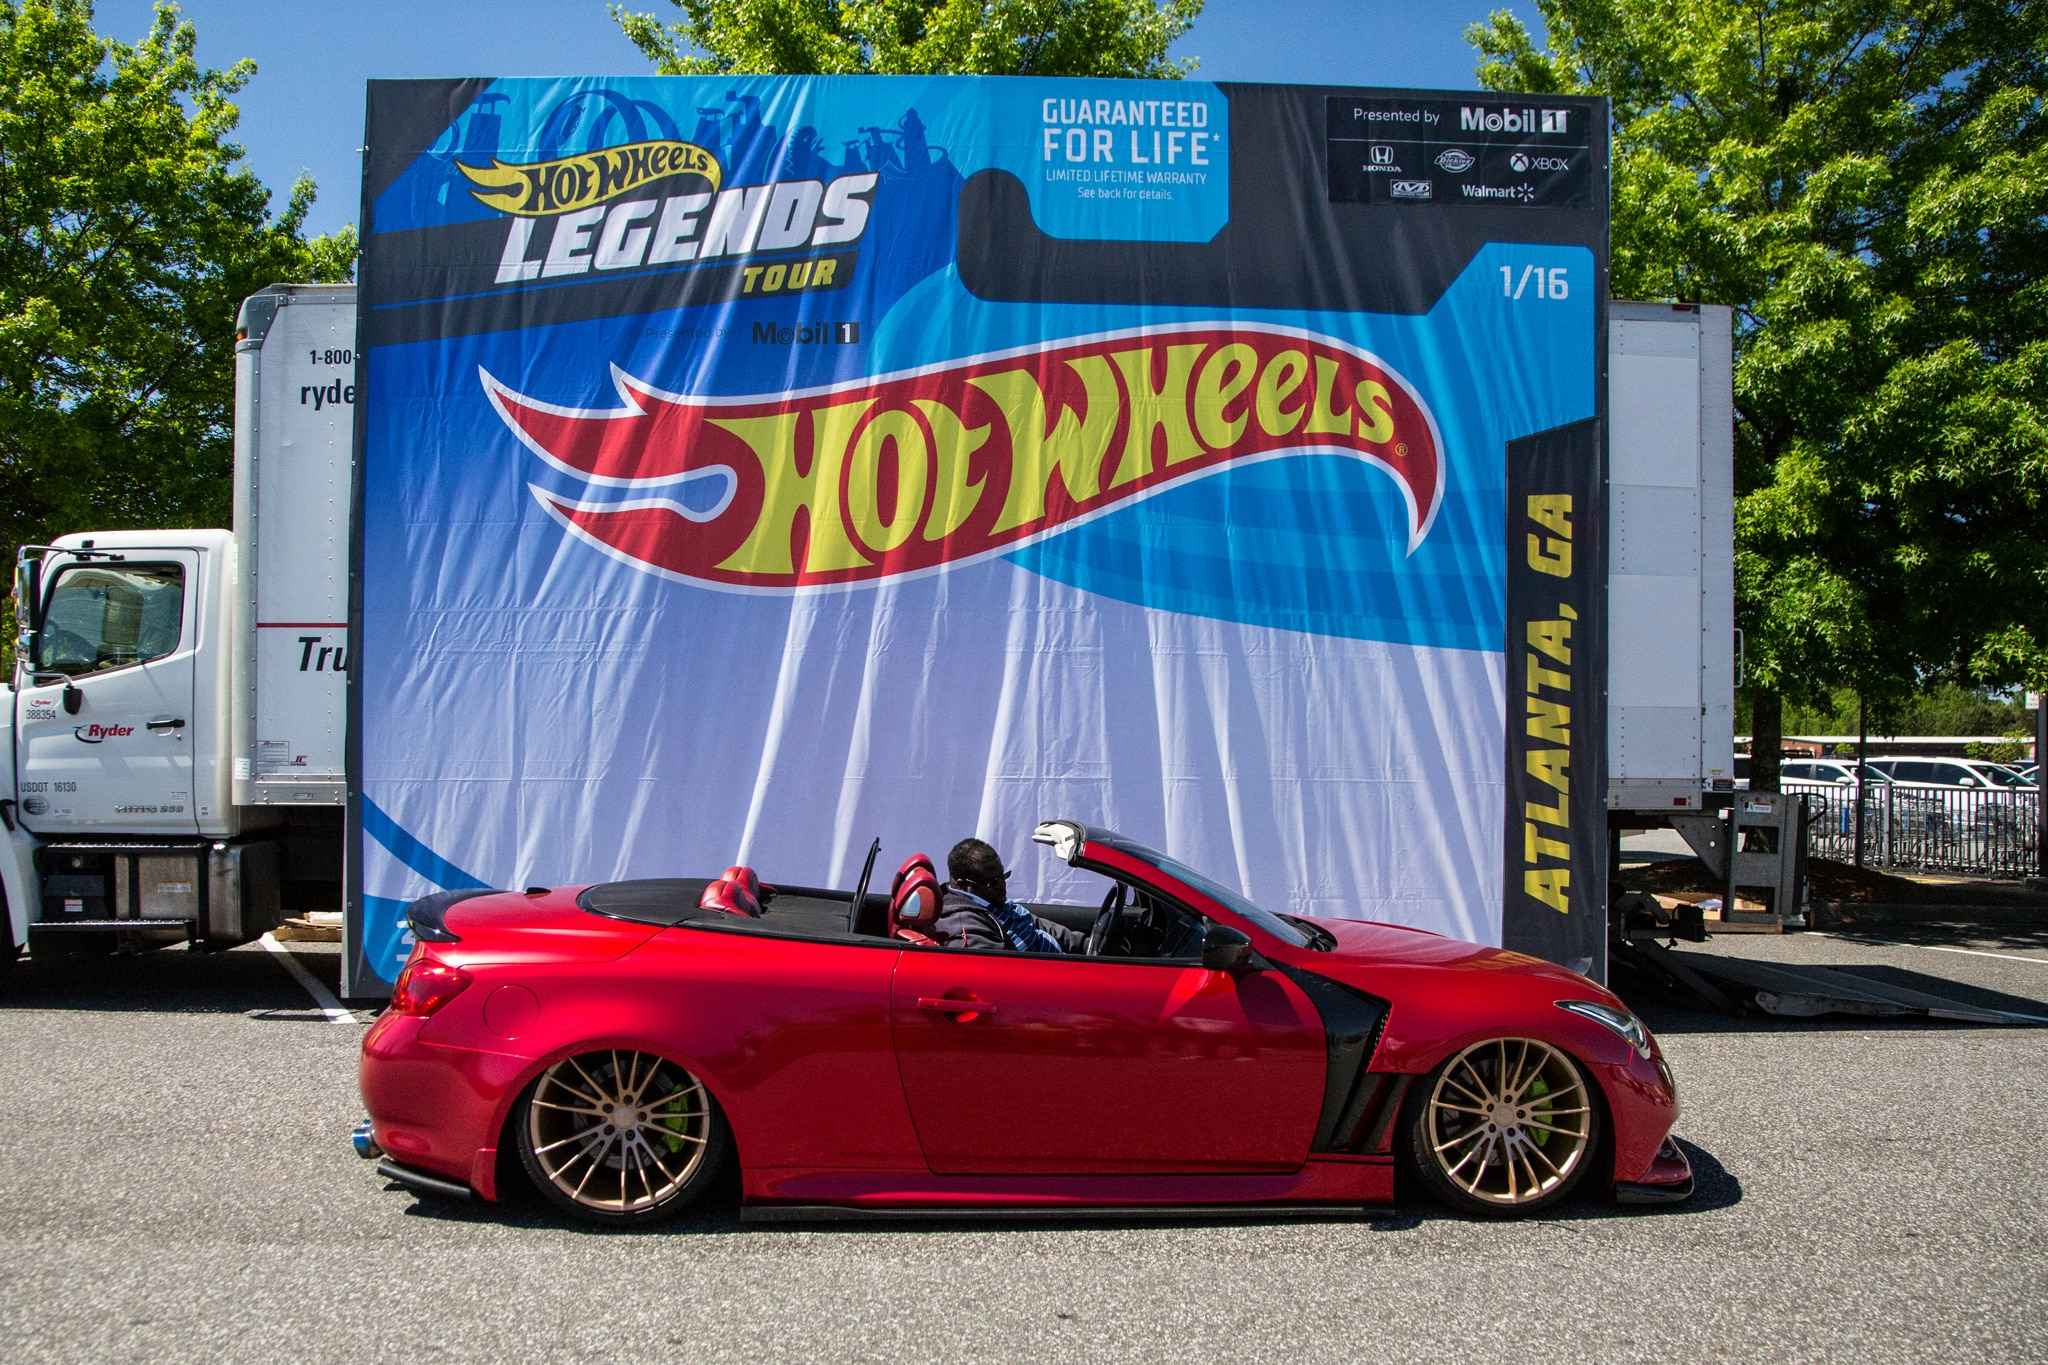 In Photos: 2019 Hot Wheels Legends Tour: Atlanta | Automobile Magazine